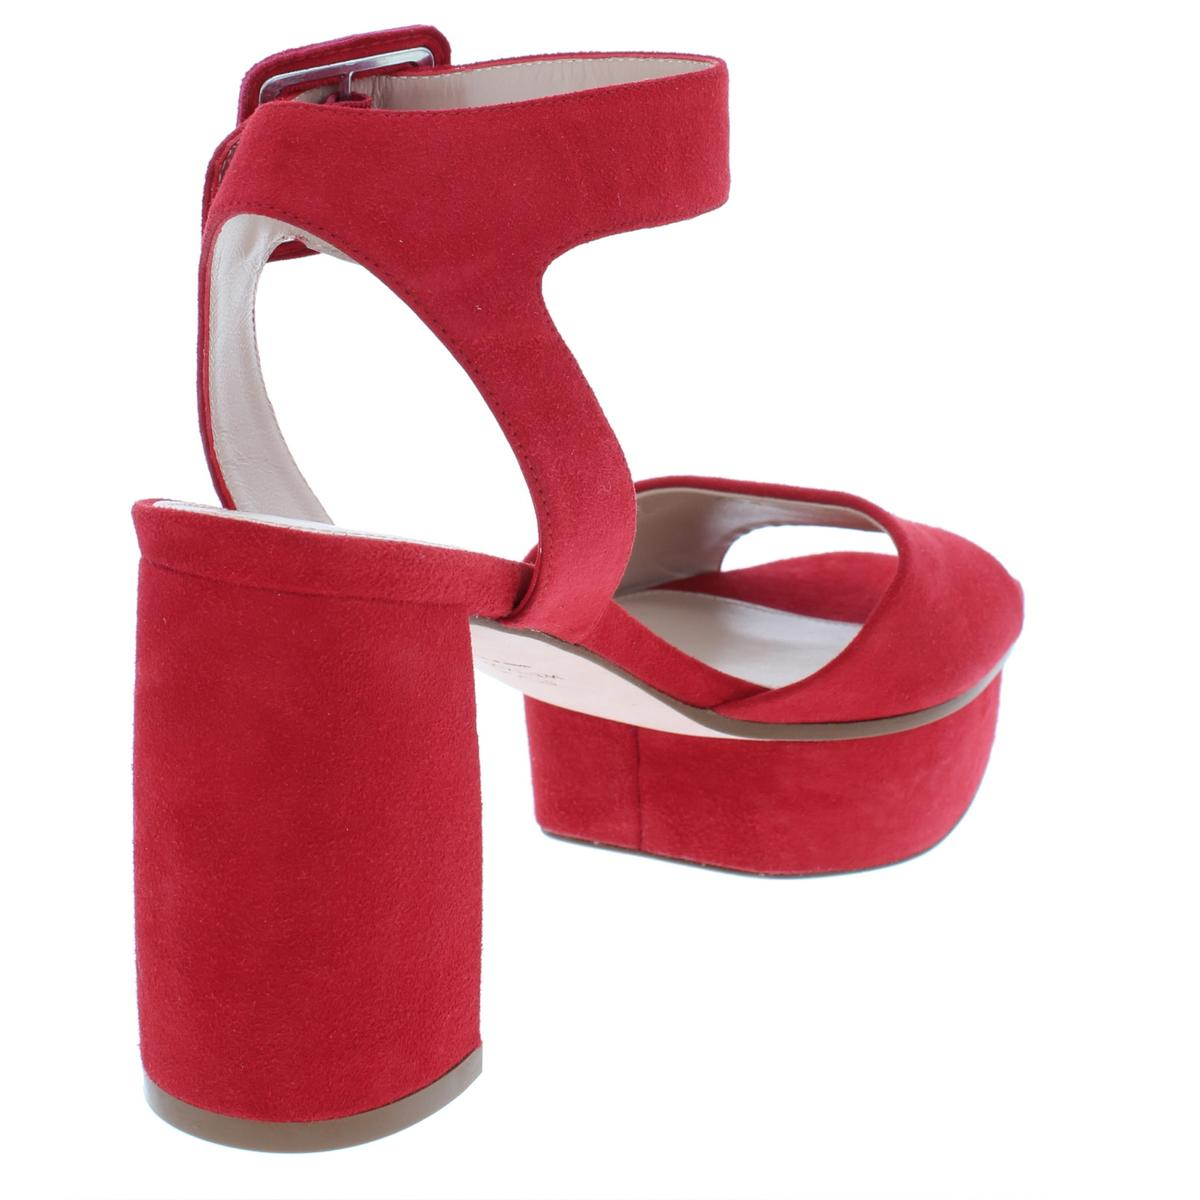 Stuart Weitzman mujer para mujer Weitzman Newdeal plataforma taco de bloque sólido Sandalias Zapatos BHFO 7961 04d550